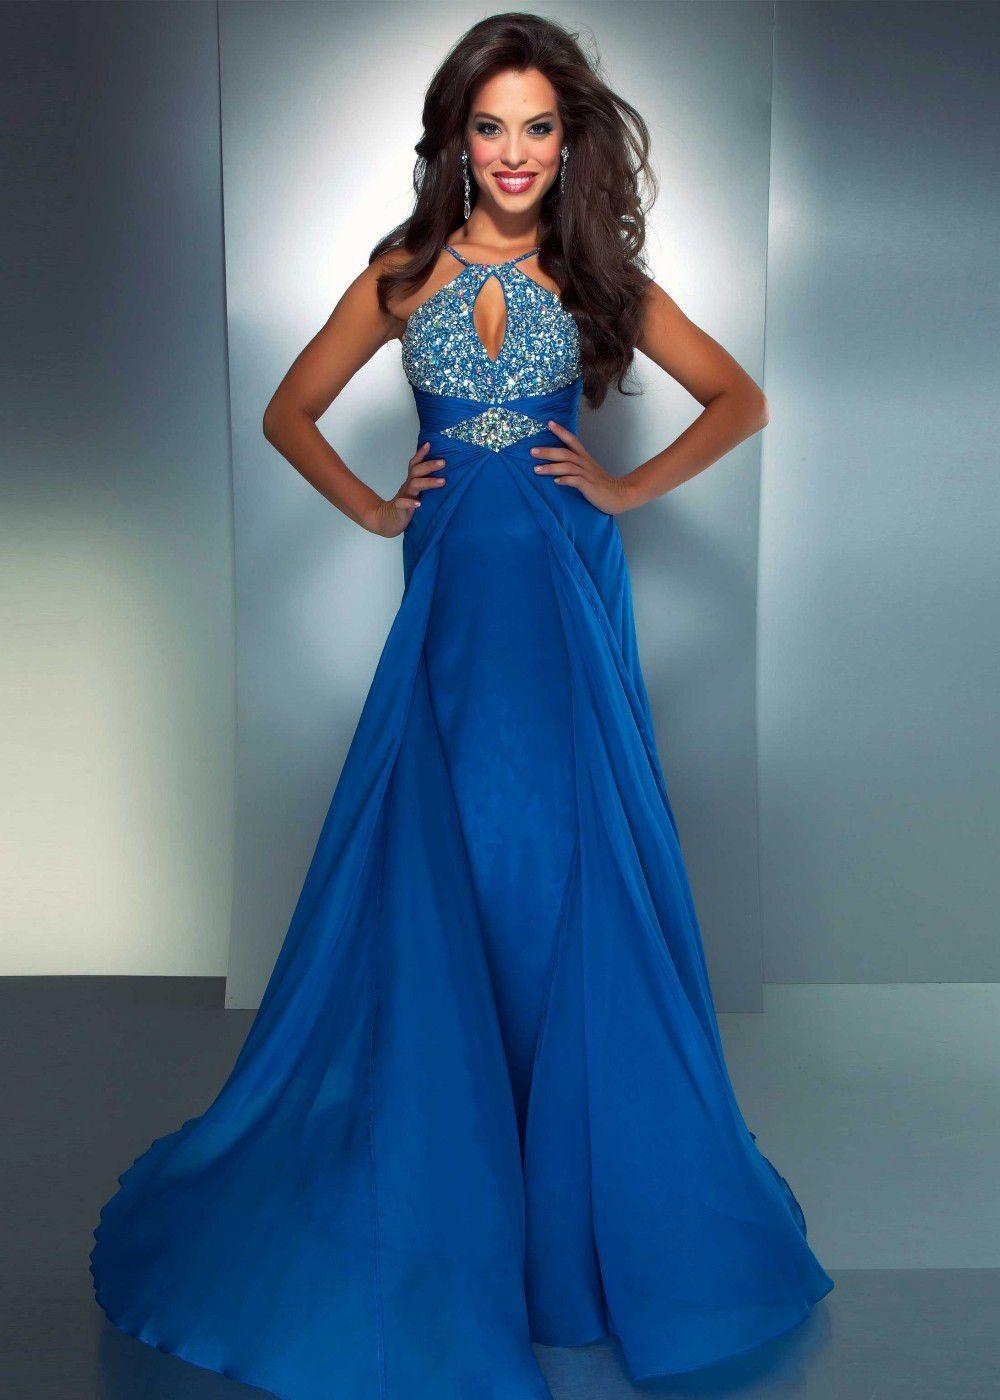 Blue halter neck prom dresses - Prom dress style